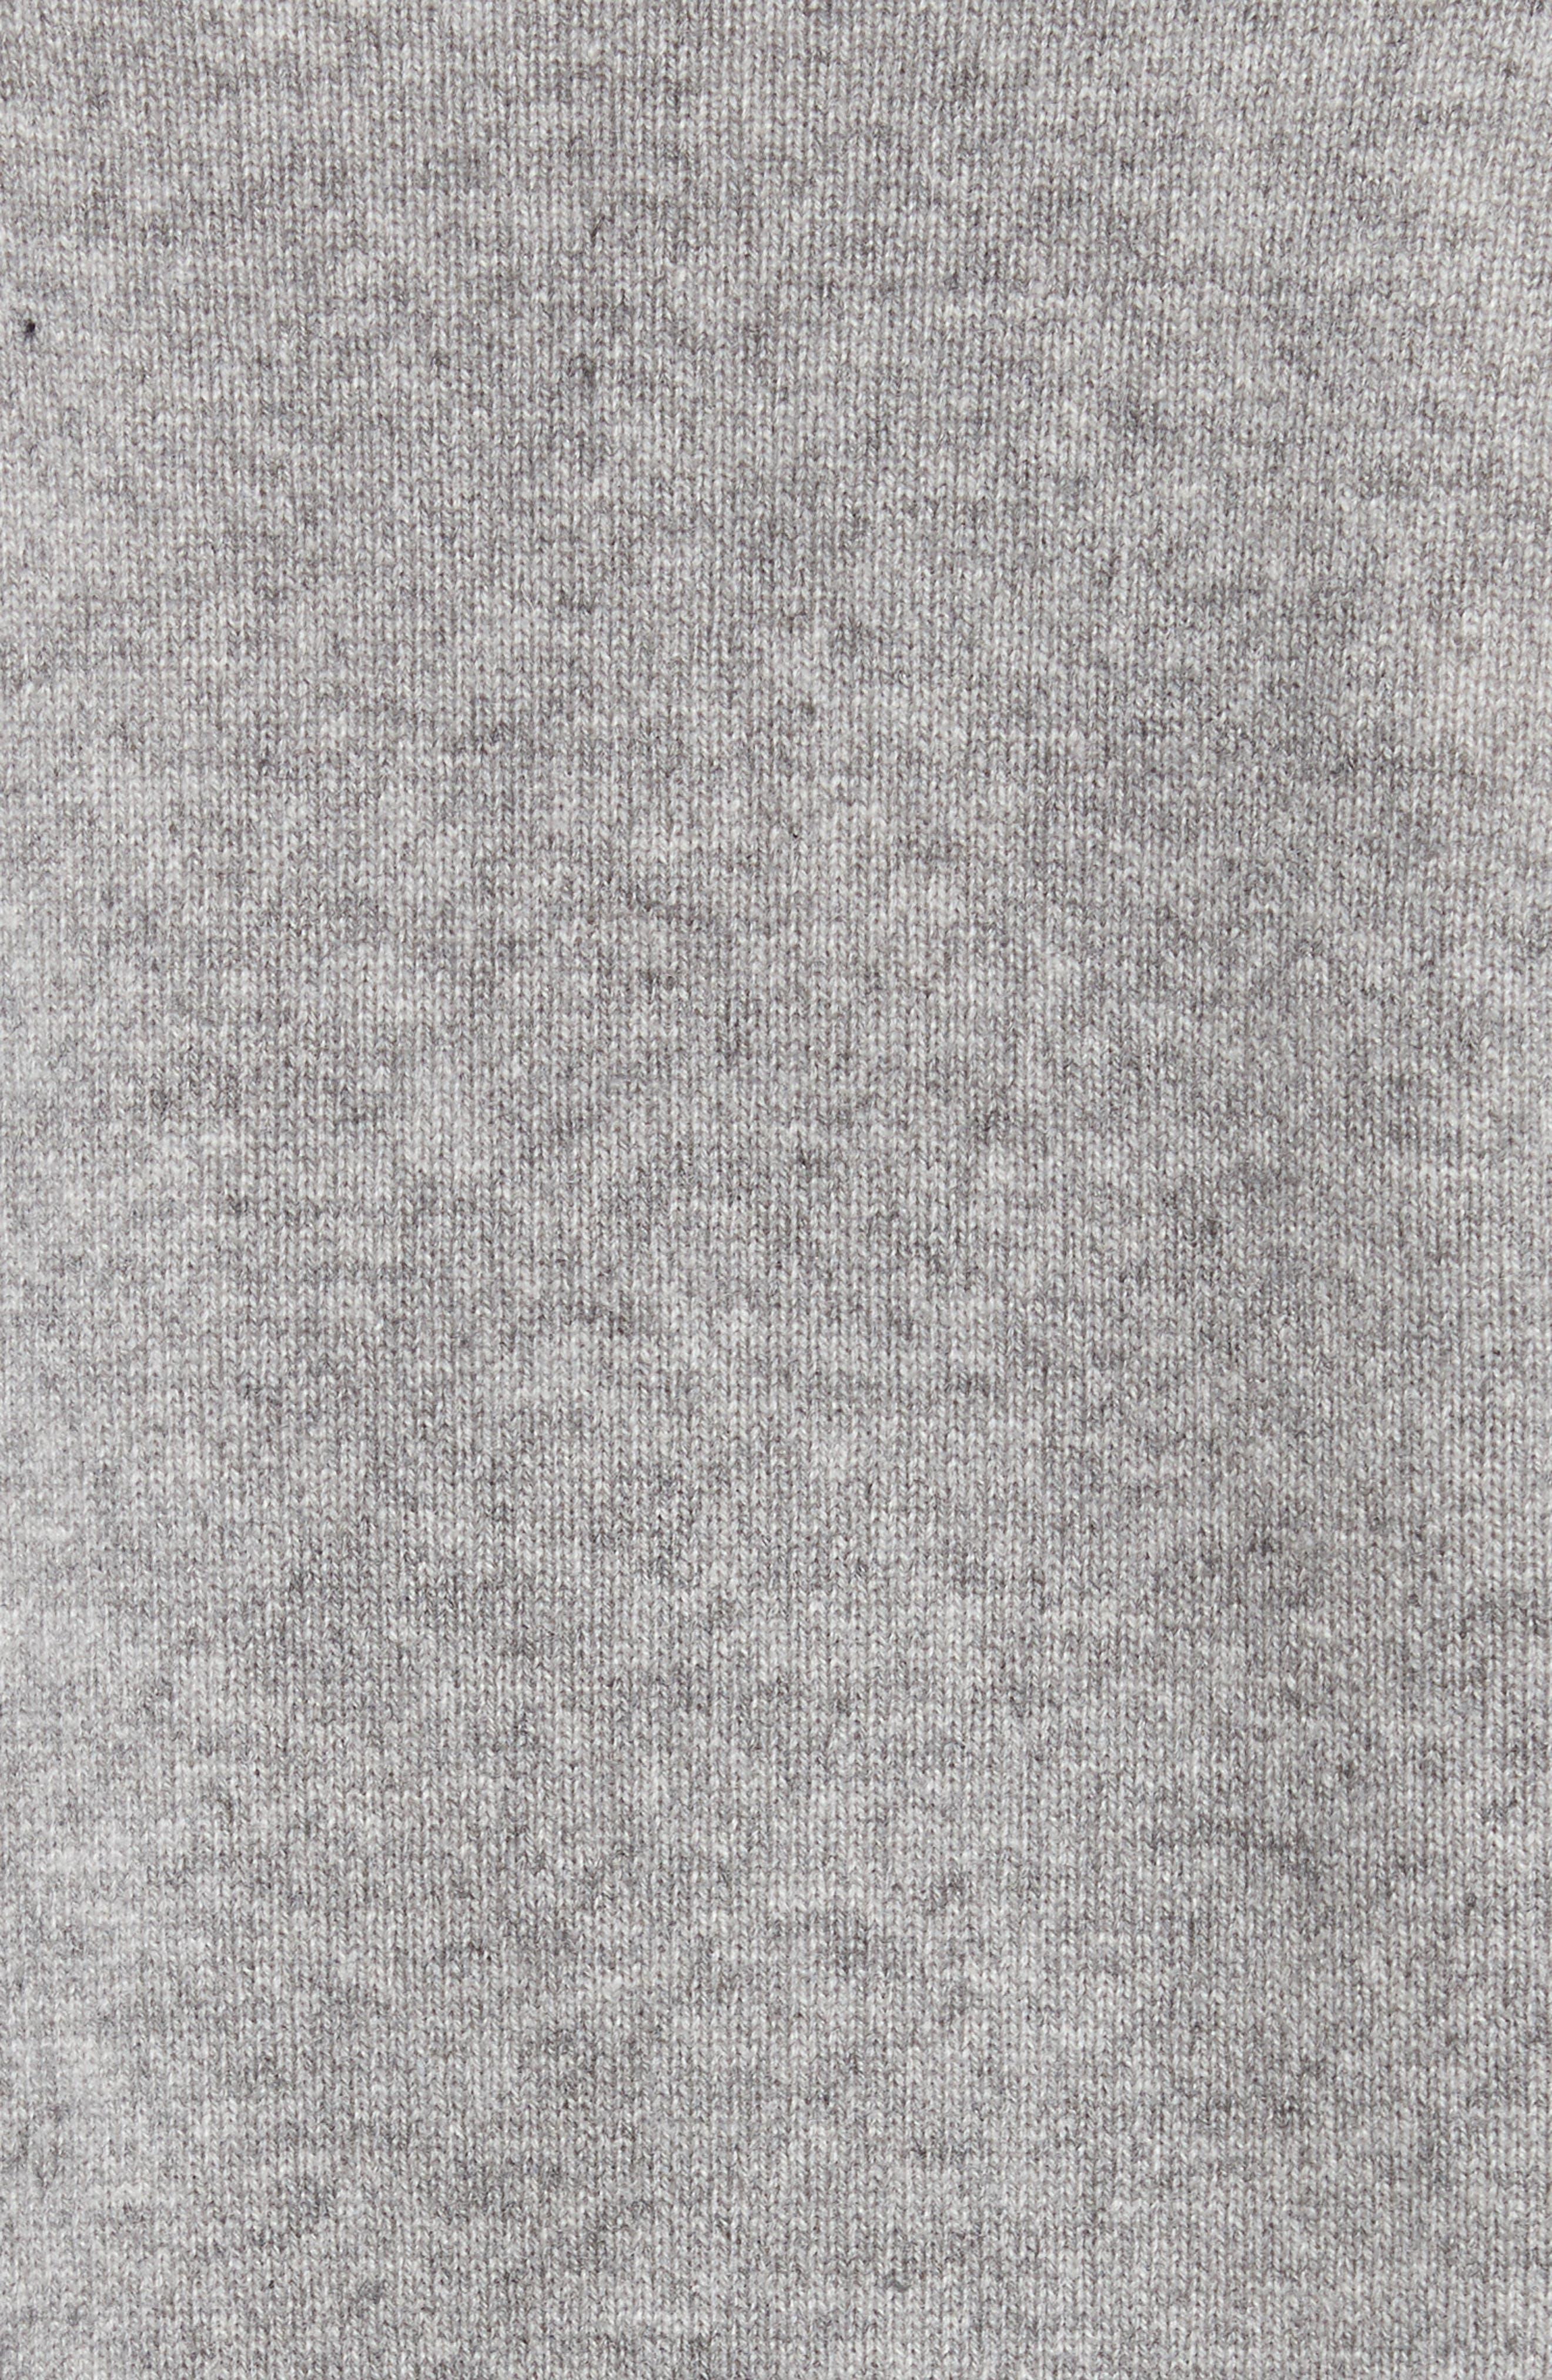 Button Sleeve Cashmere Sweater,                             Alternate thumbnail 5, color,                             Husky